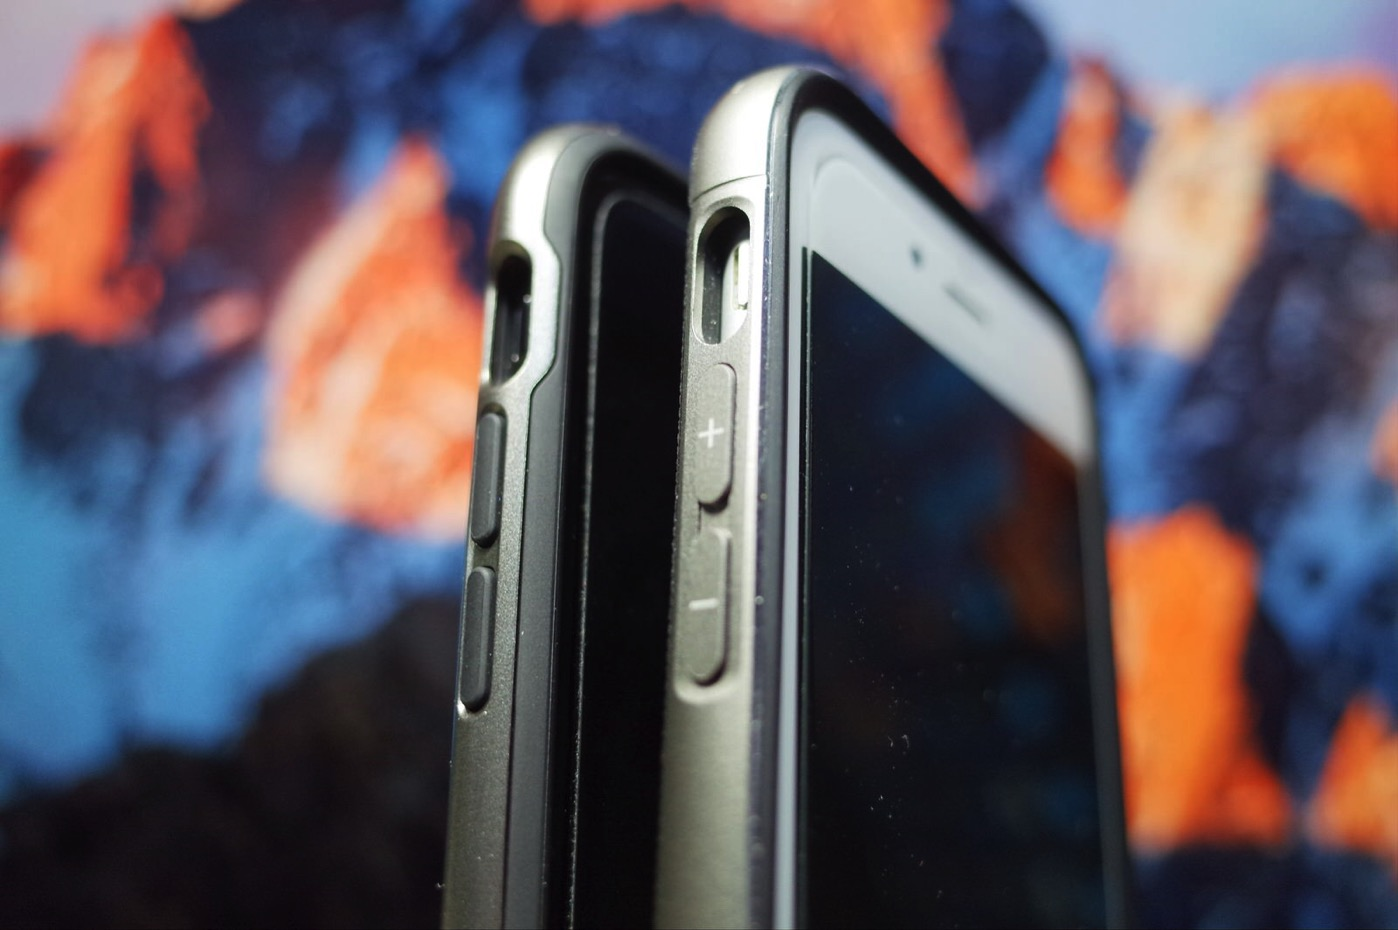 【Spigen】 iPhone7 ケース, ネオ・ハイブリッド [ 米軍MIL規格取得 二重構造 バンパー ] アイフォン 7 用 カバー (iPhone7, ガンメタル)-10